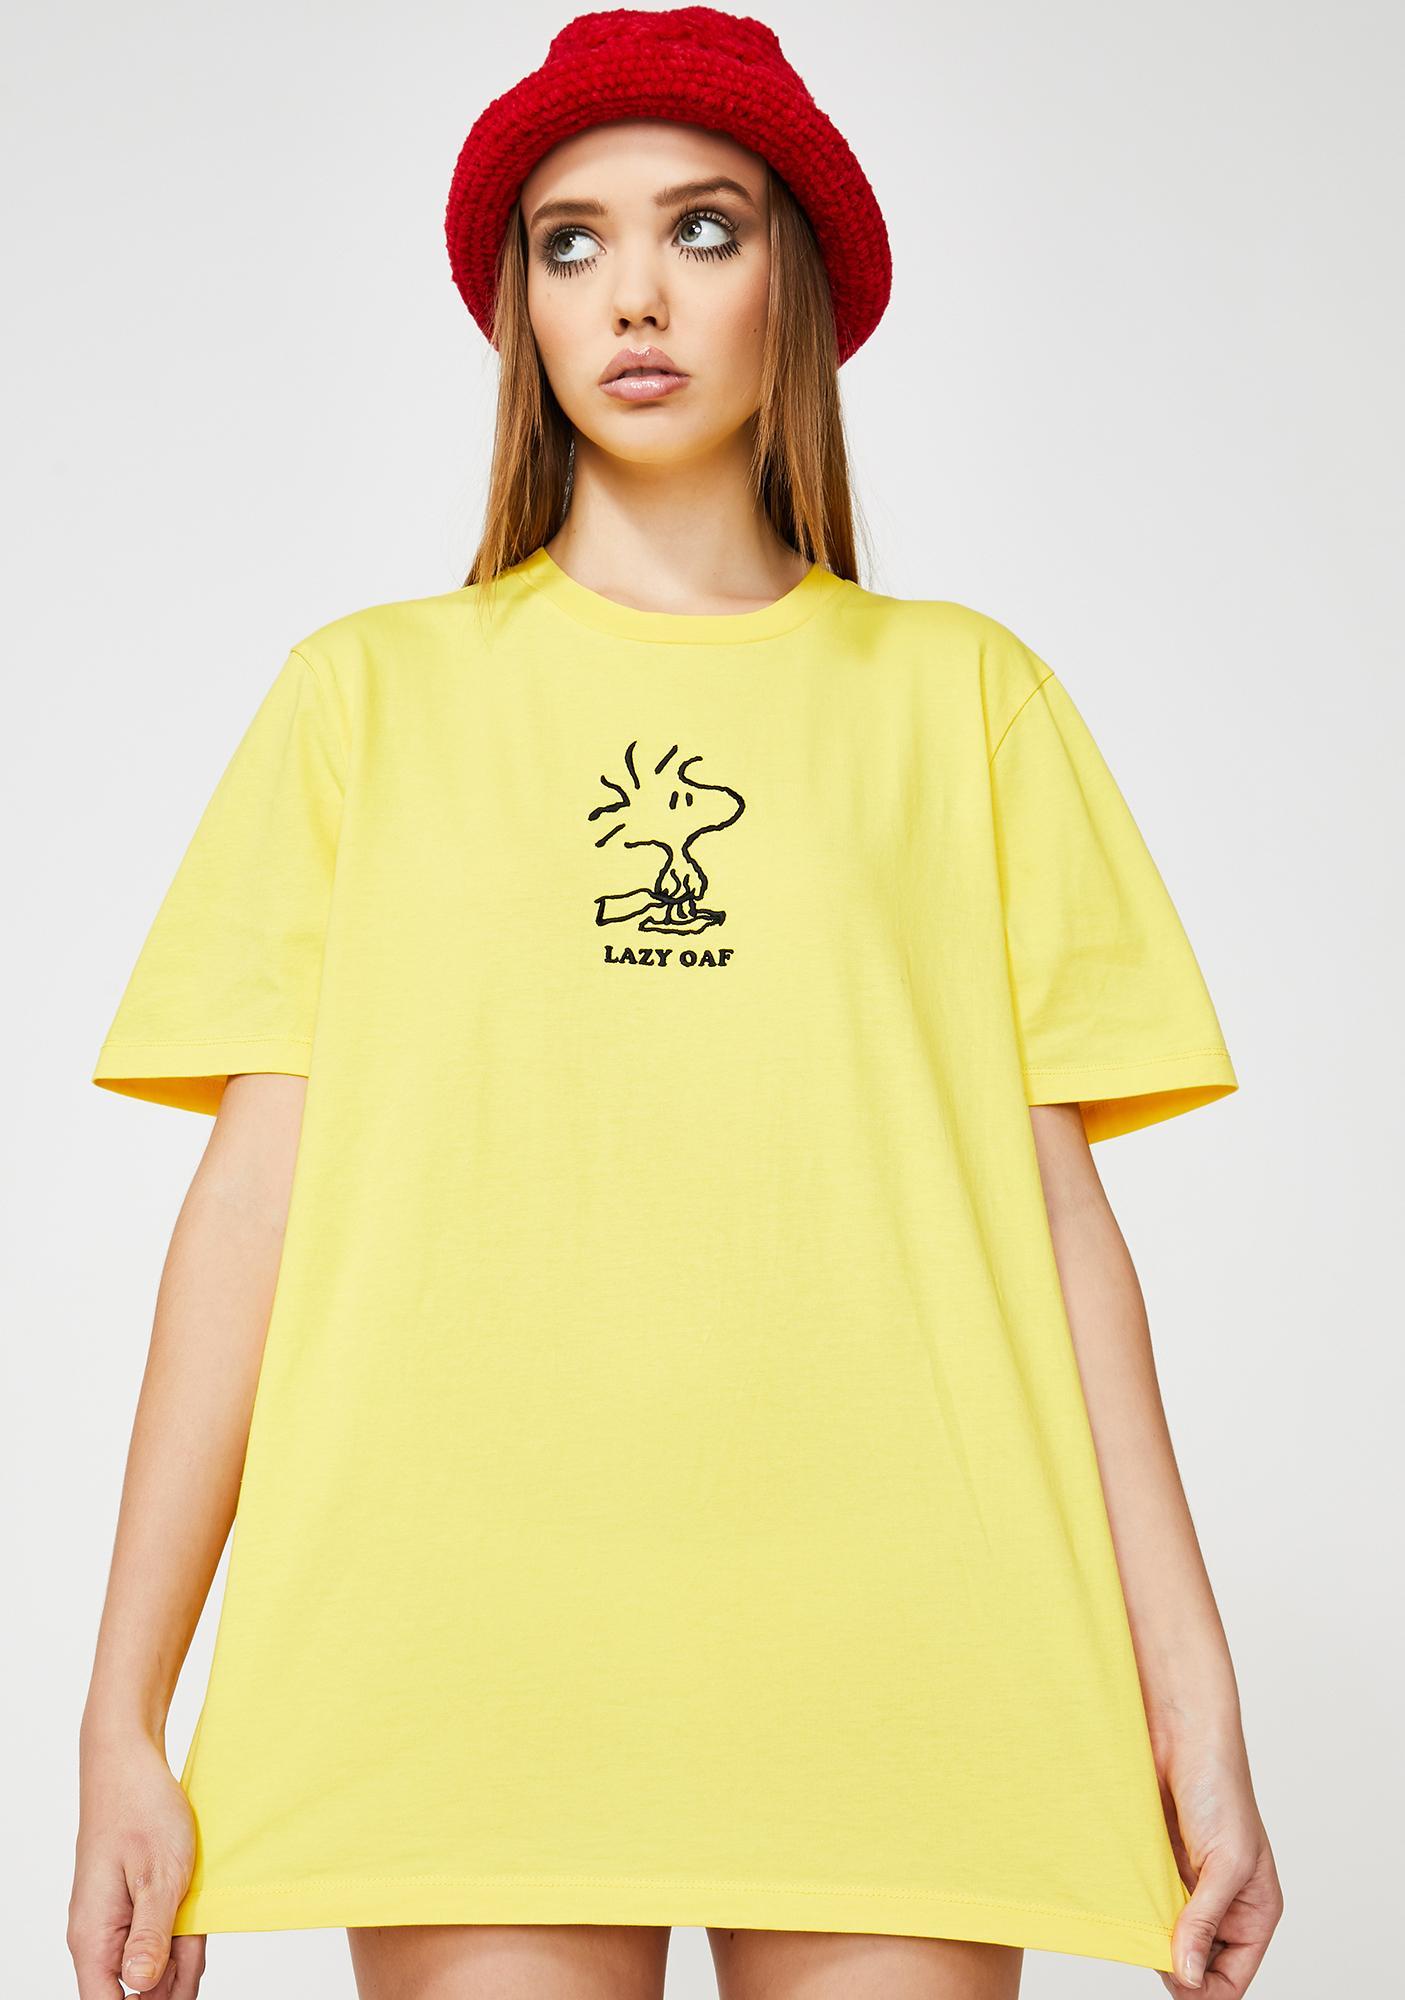 Lazy Oaf X Peanuts Woodstock Graphic T-Shirt